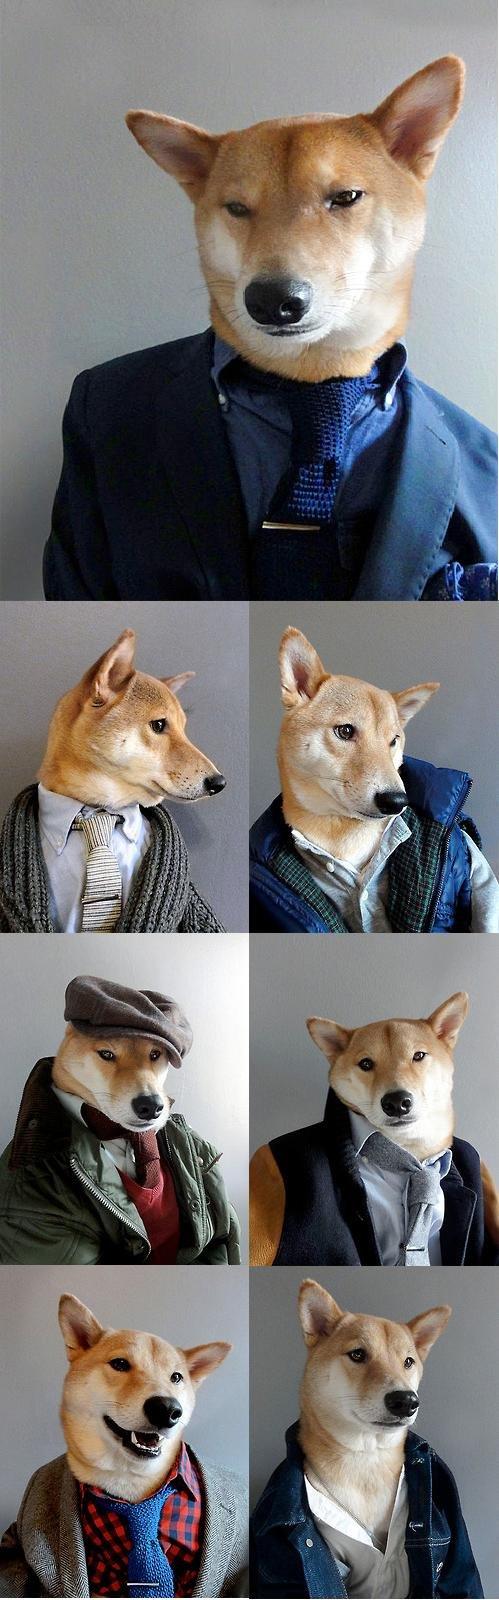 Doggy Style. i got it off tumblr.